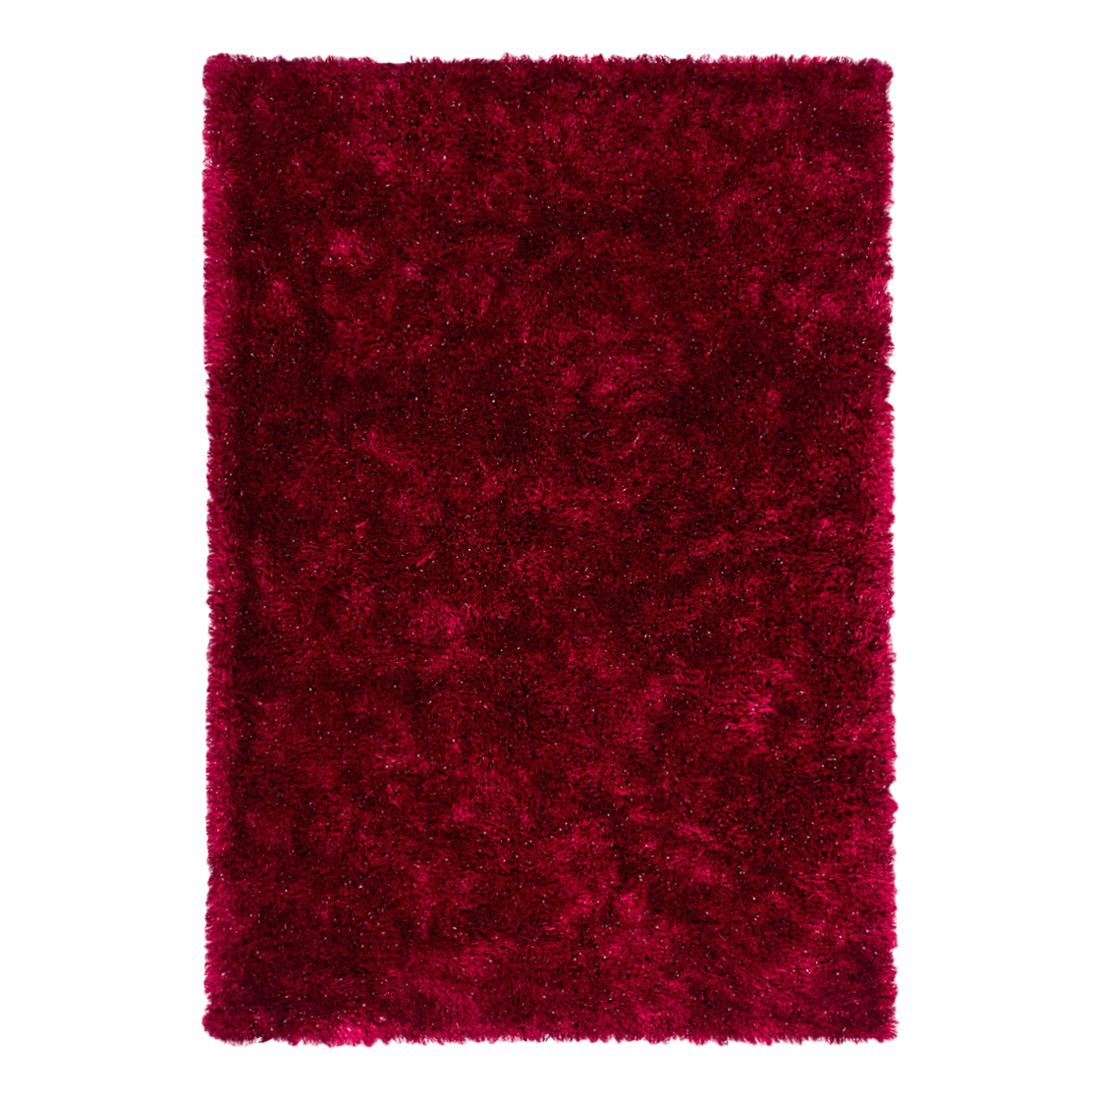 Teppich Barbados – Greenland – Rot – 120 x 170 cm, Kayoom bestellen